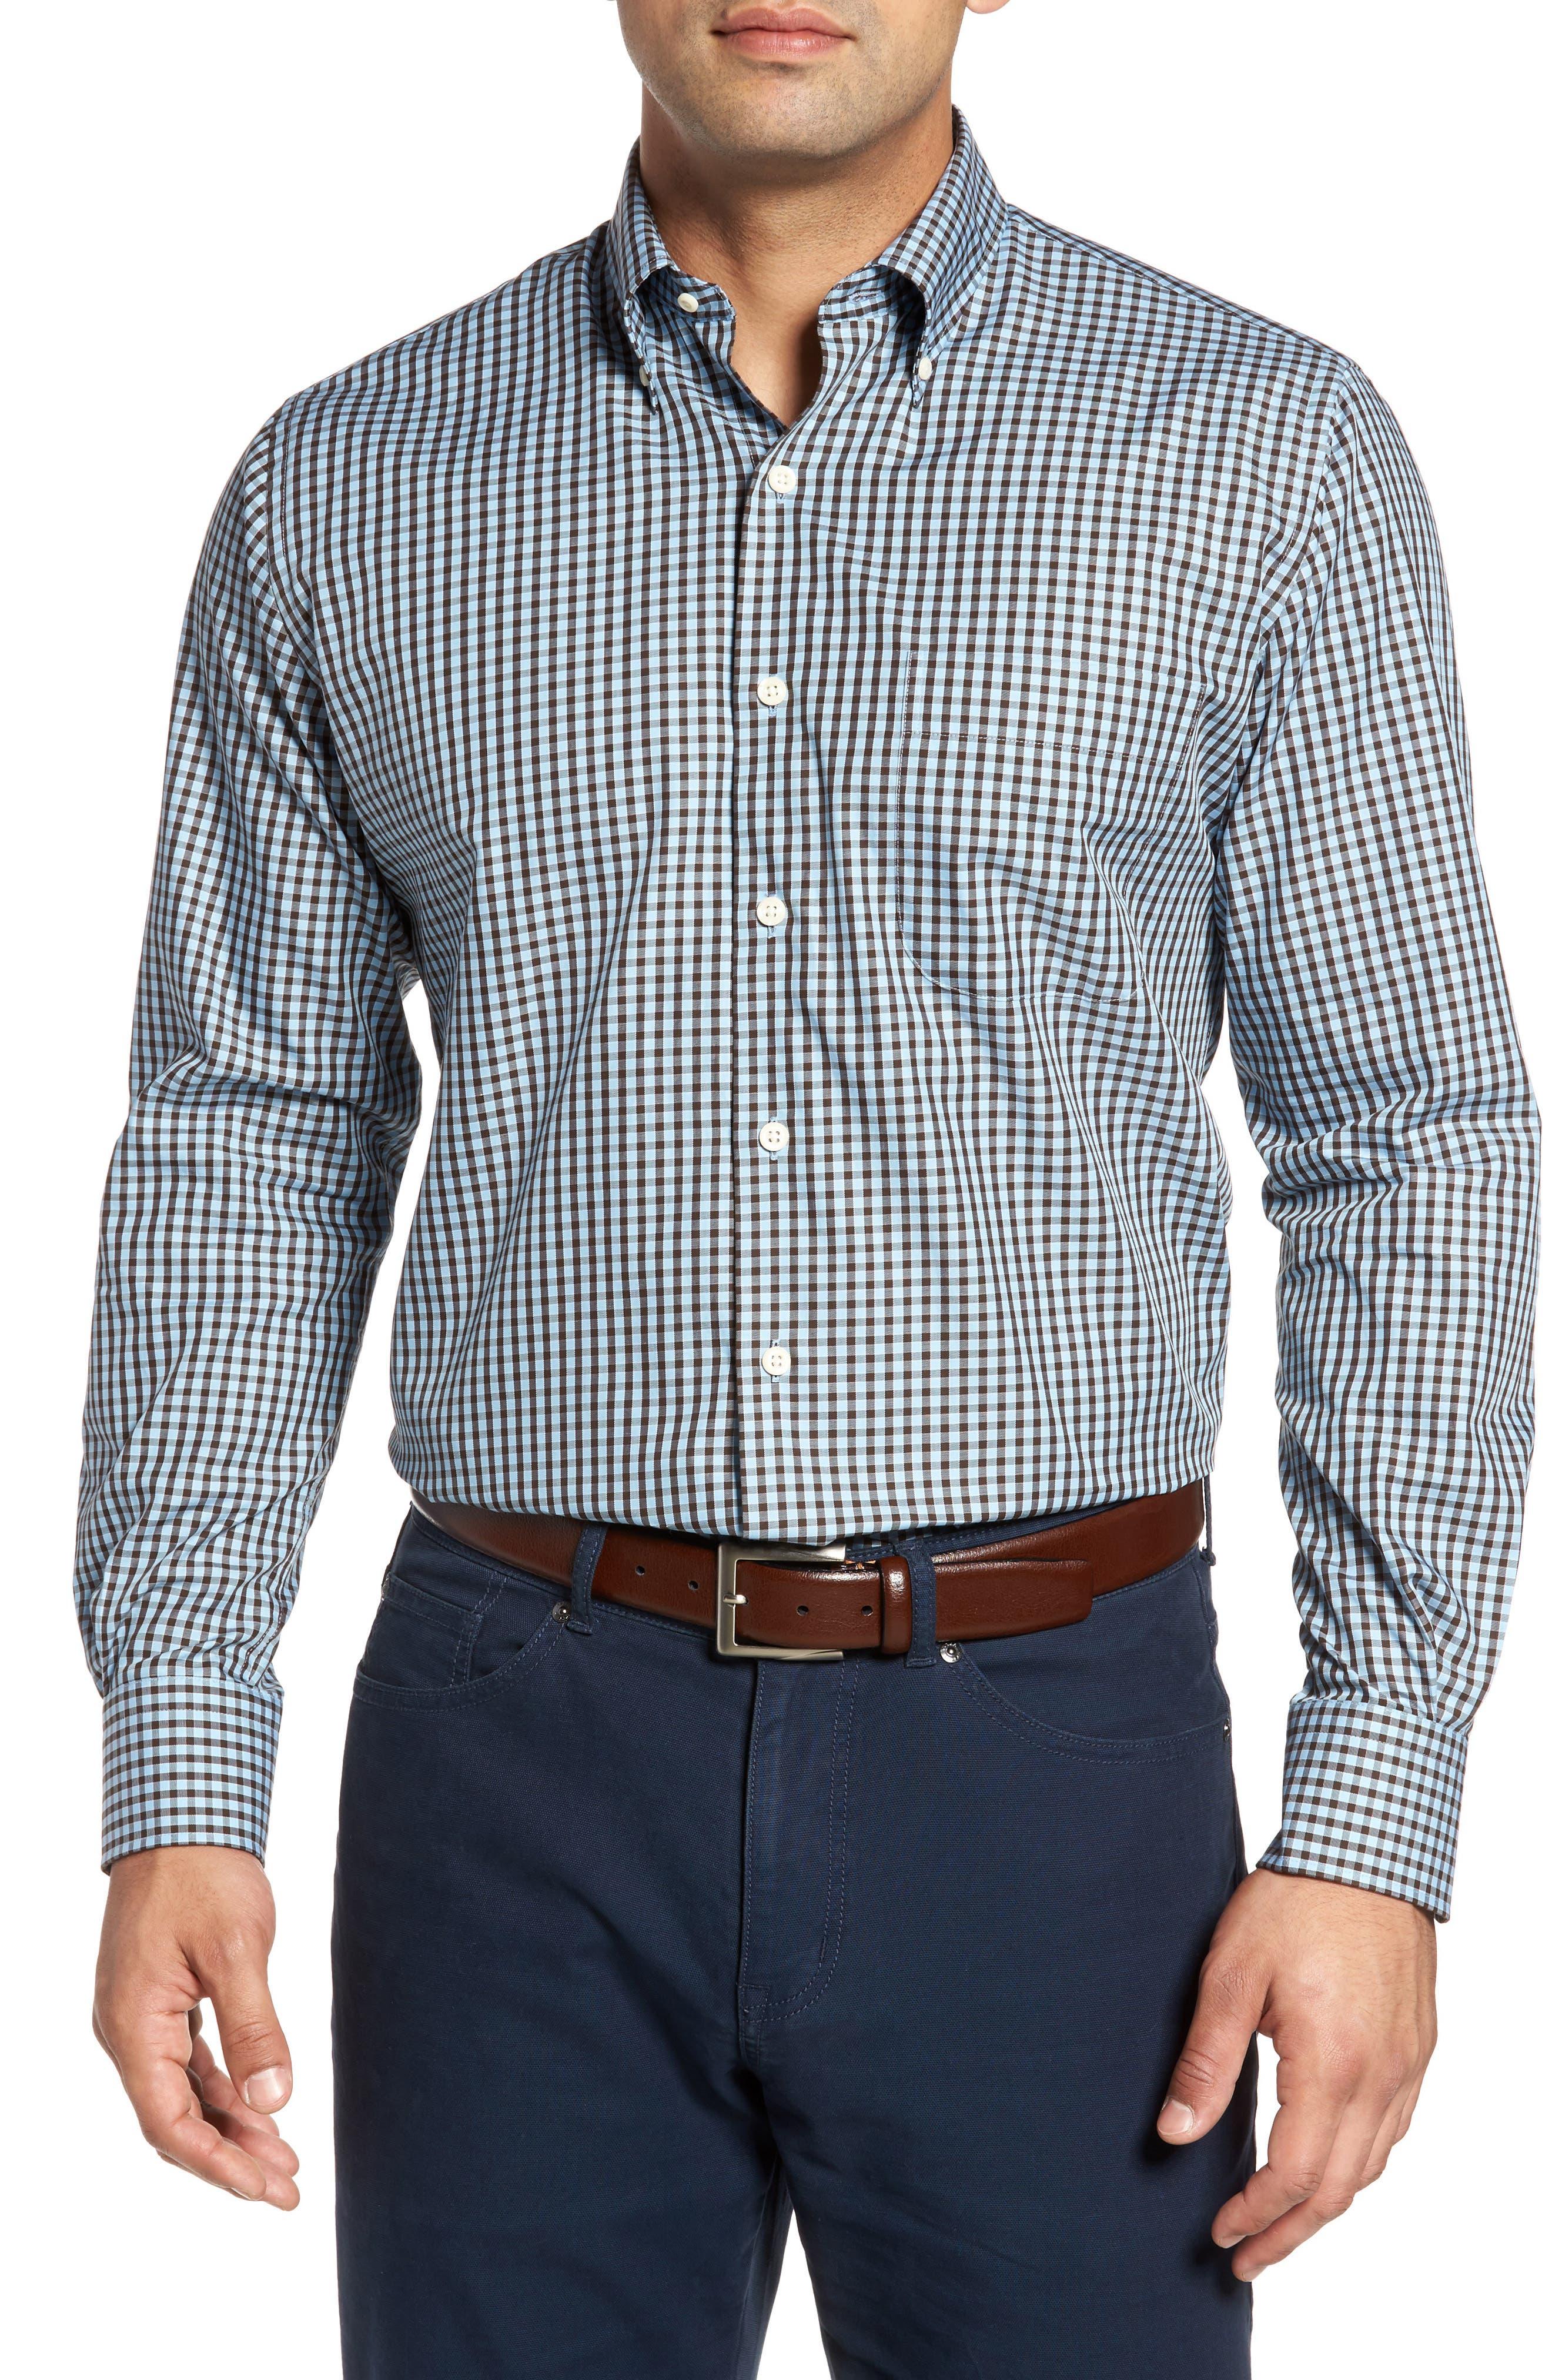 Main Image - Peter Millar Midwinter Gingham Regular Fit Sport Shirt